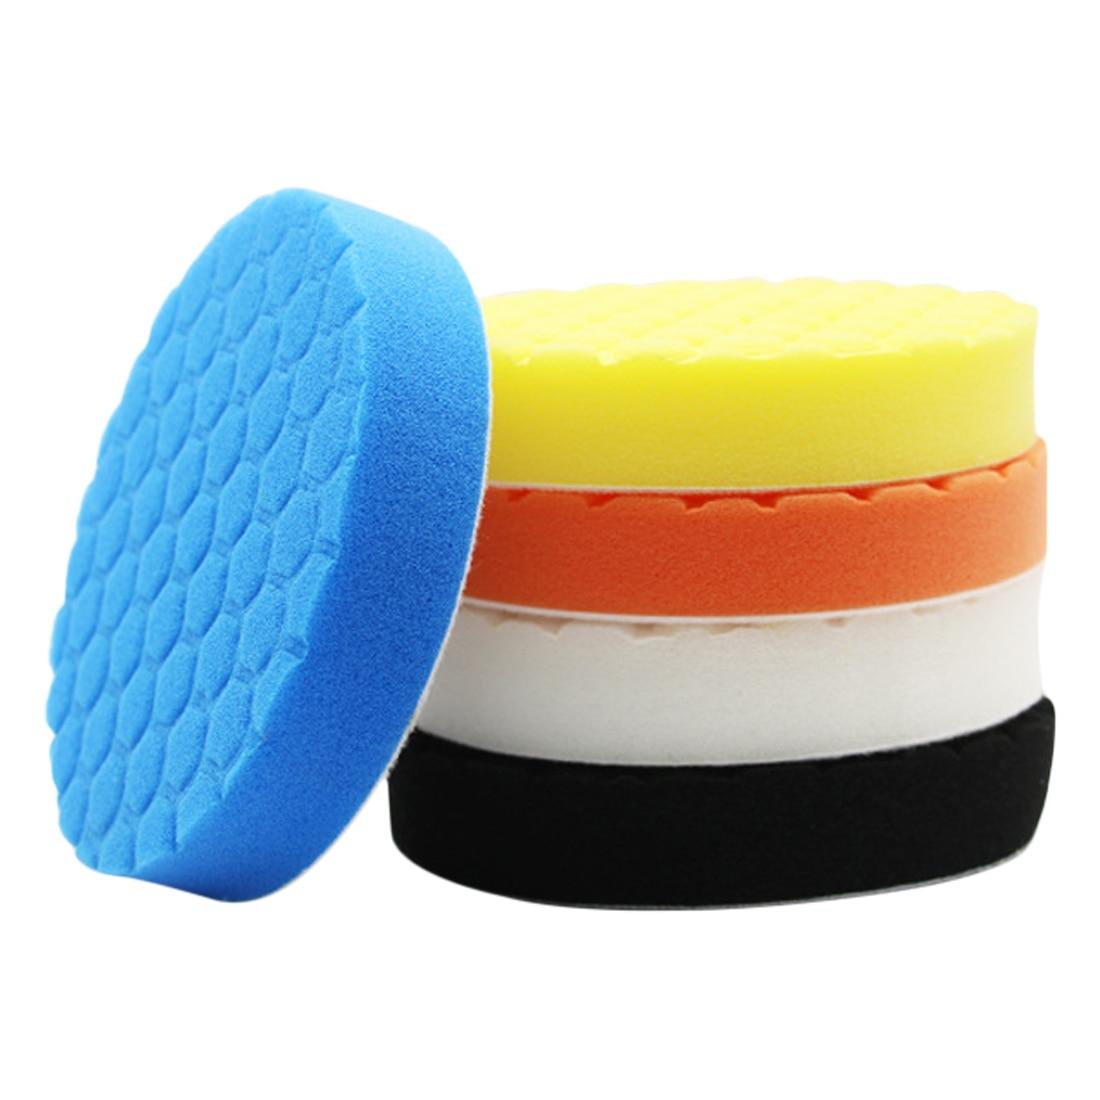 3pcs Hexagonal Polished Sponge Disc Buffing Sponge Polishing Pad Kit Set For Car Polisher Buffer 3/4/5/6/7inch